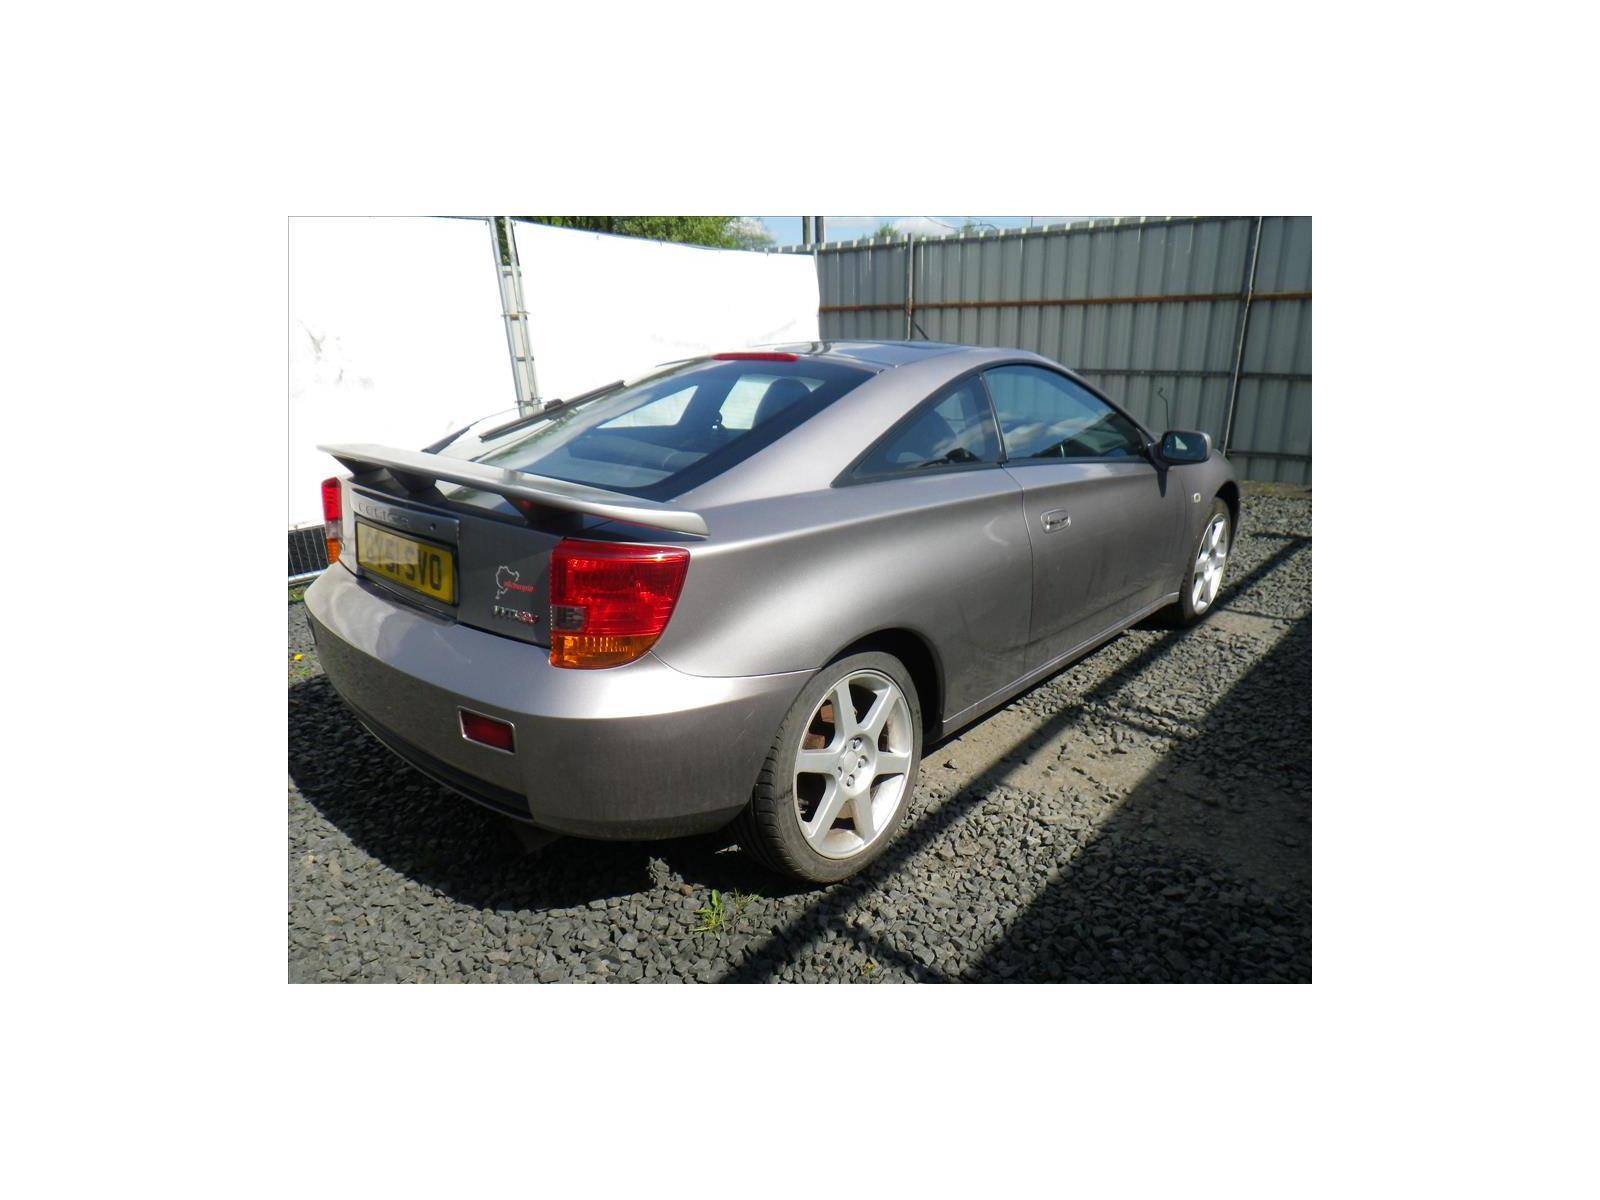 ... 2001 Toyota Celica 1999 To 2006 1.8l Manual Petrol Starter Motor ...